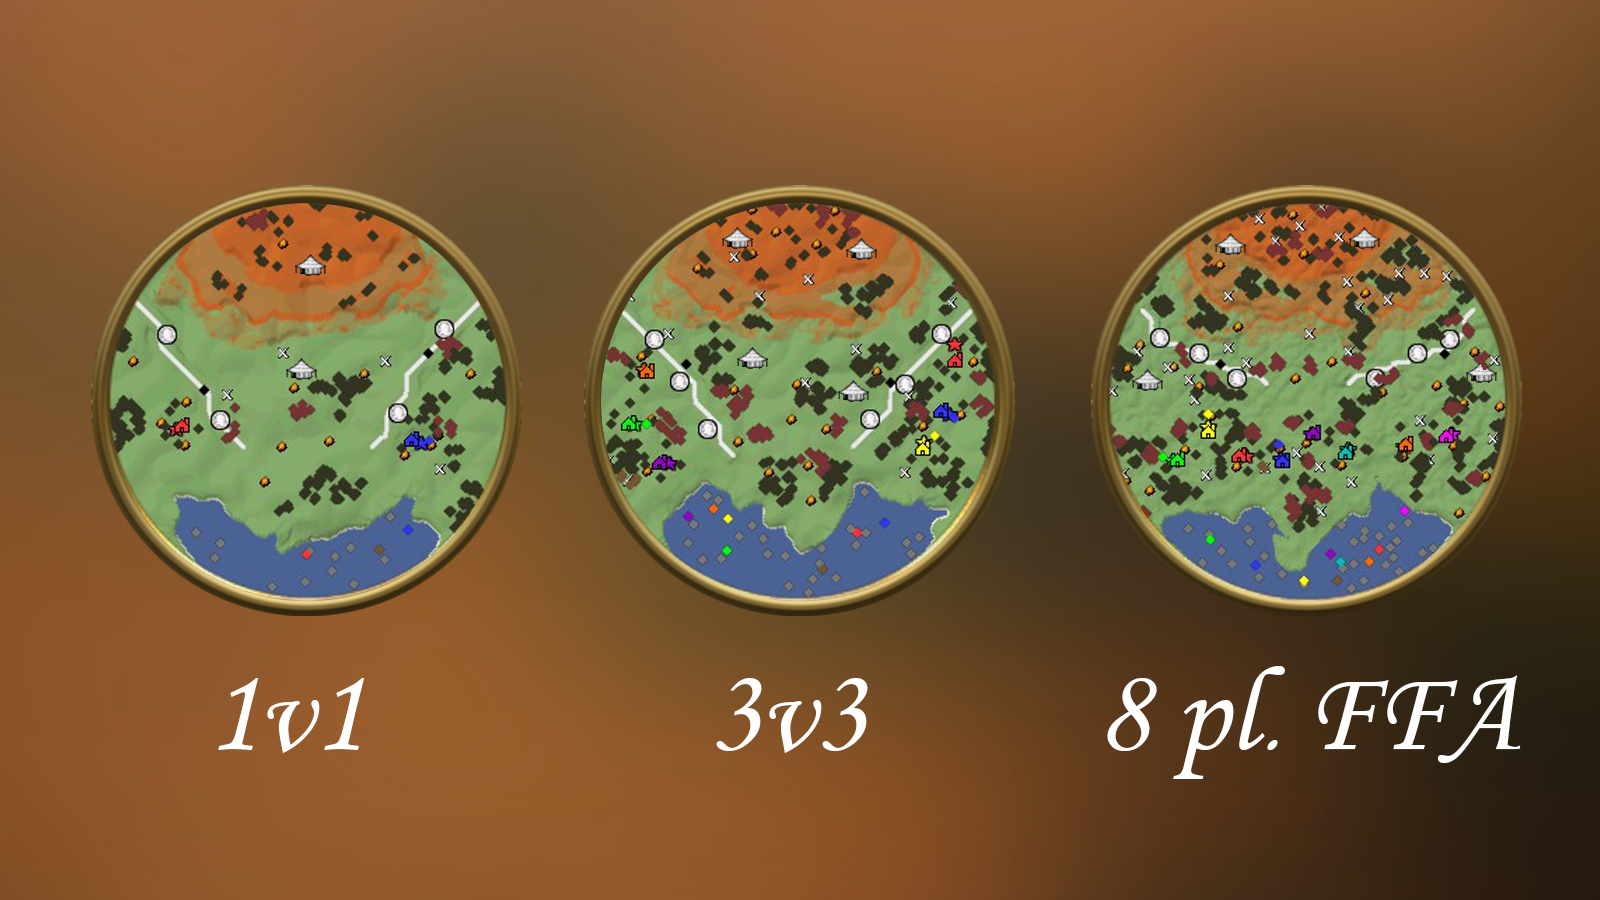 Minimaps for different configurations